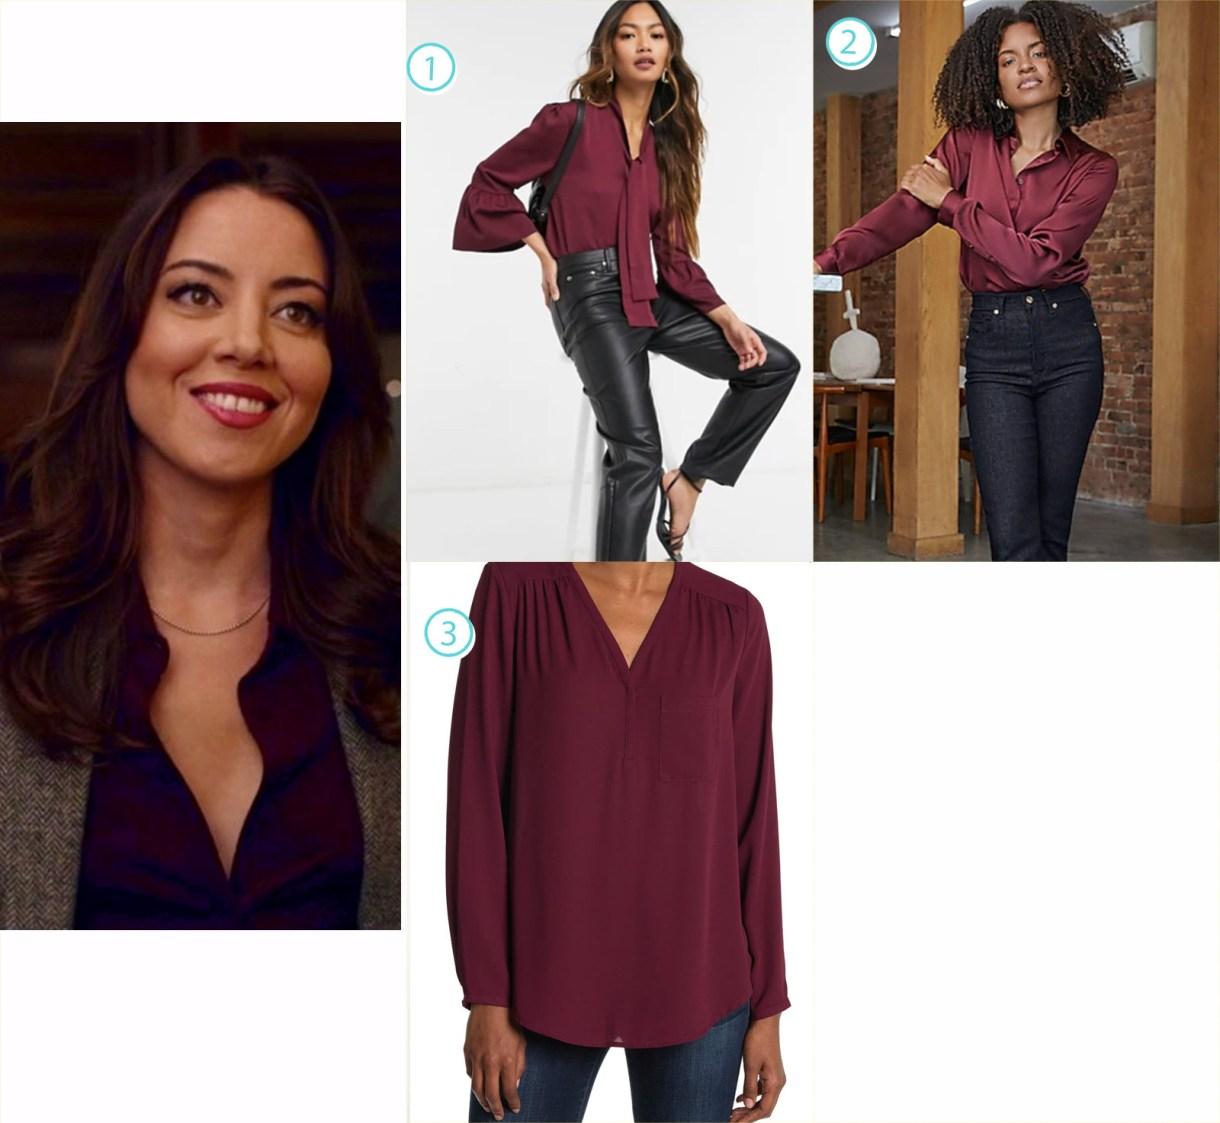 A variety of purple blouses like Aubrey Plaza